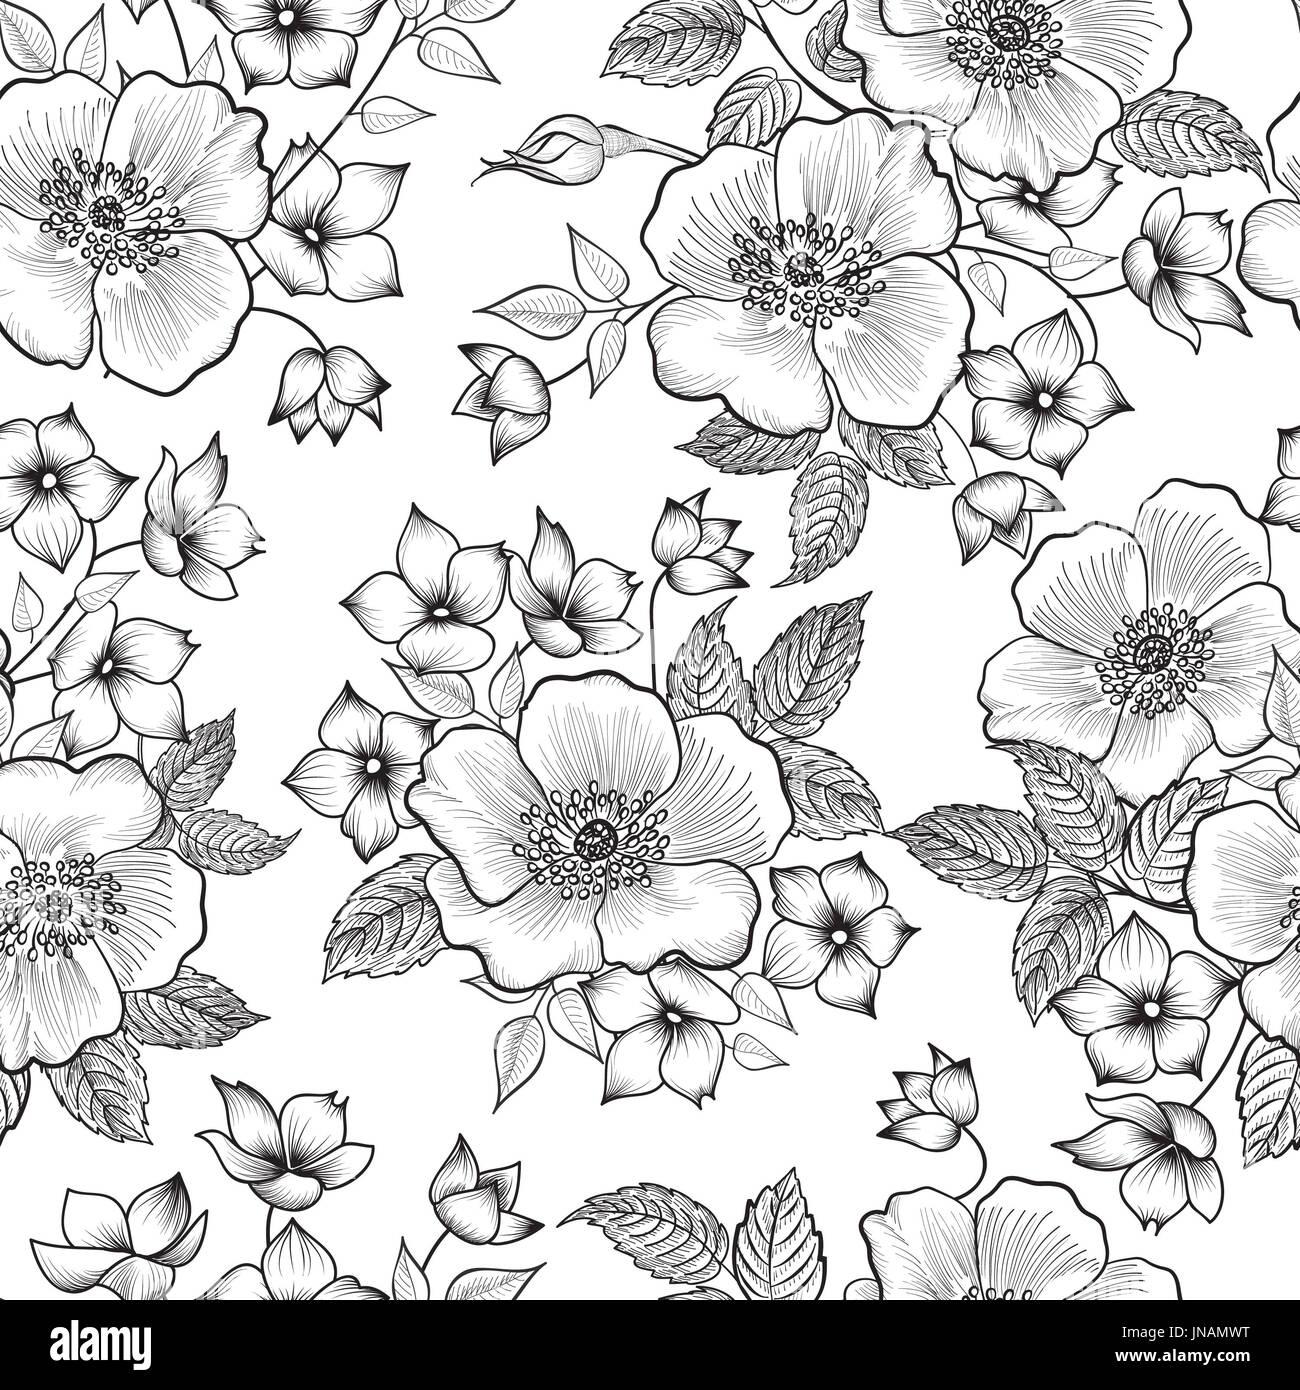 Elegant black white flower seamless stock photos elegant black floral seamless pattern abstract flower background floral seamless texture with flowers stock mightylinksfo